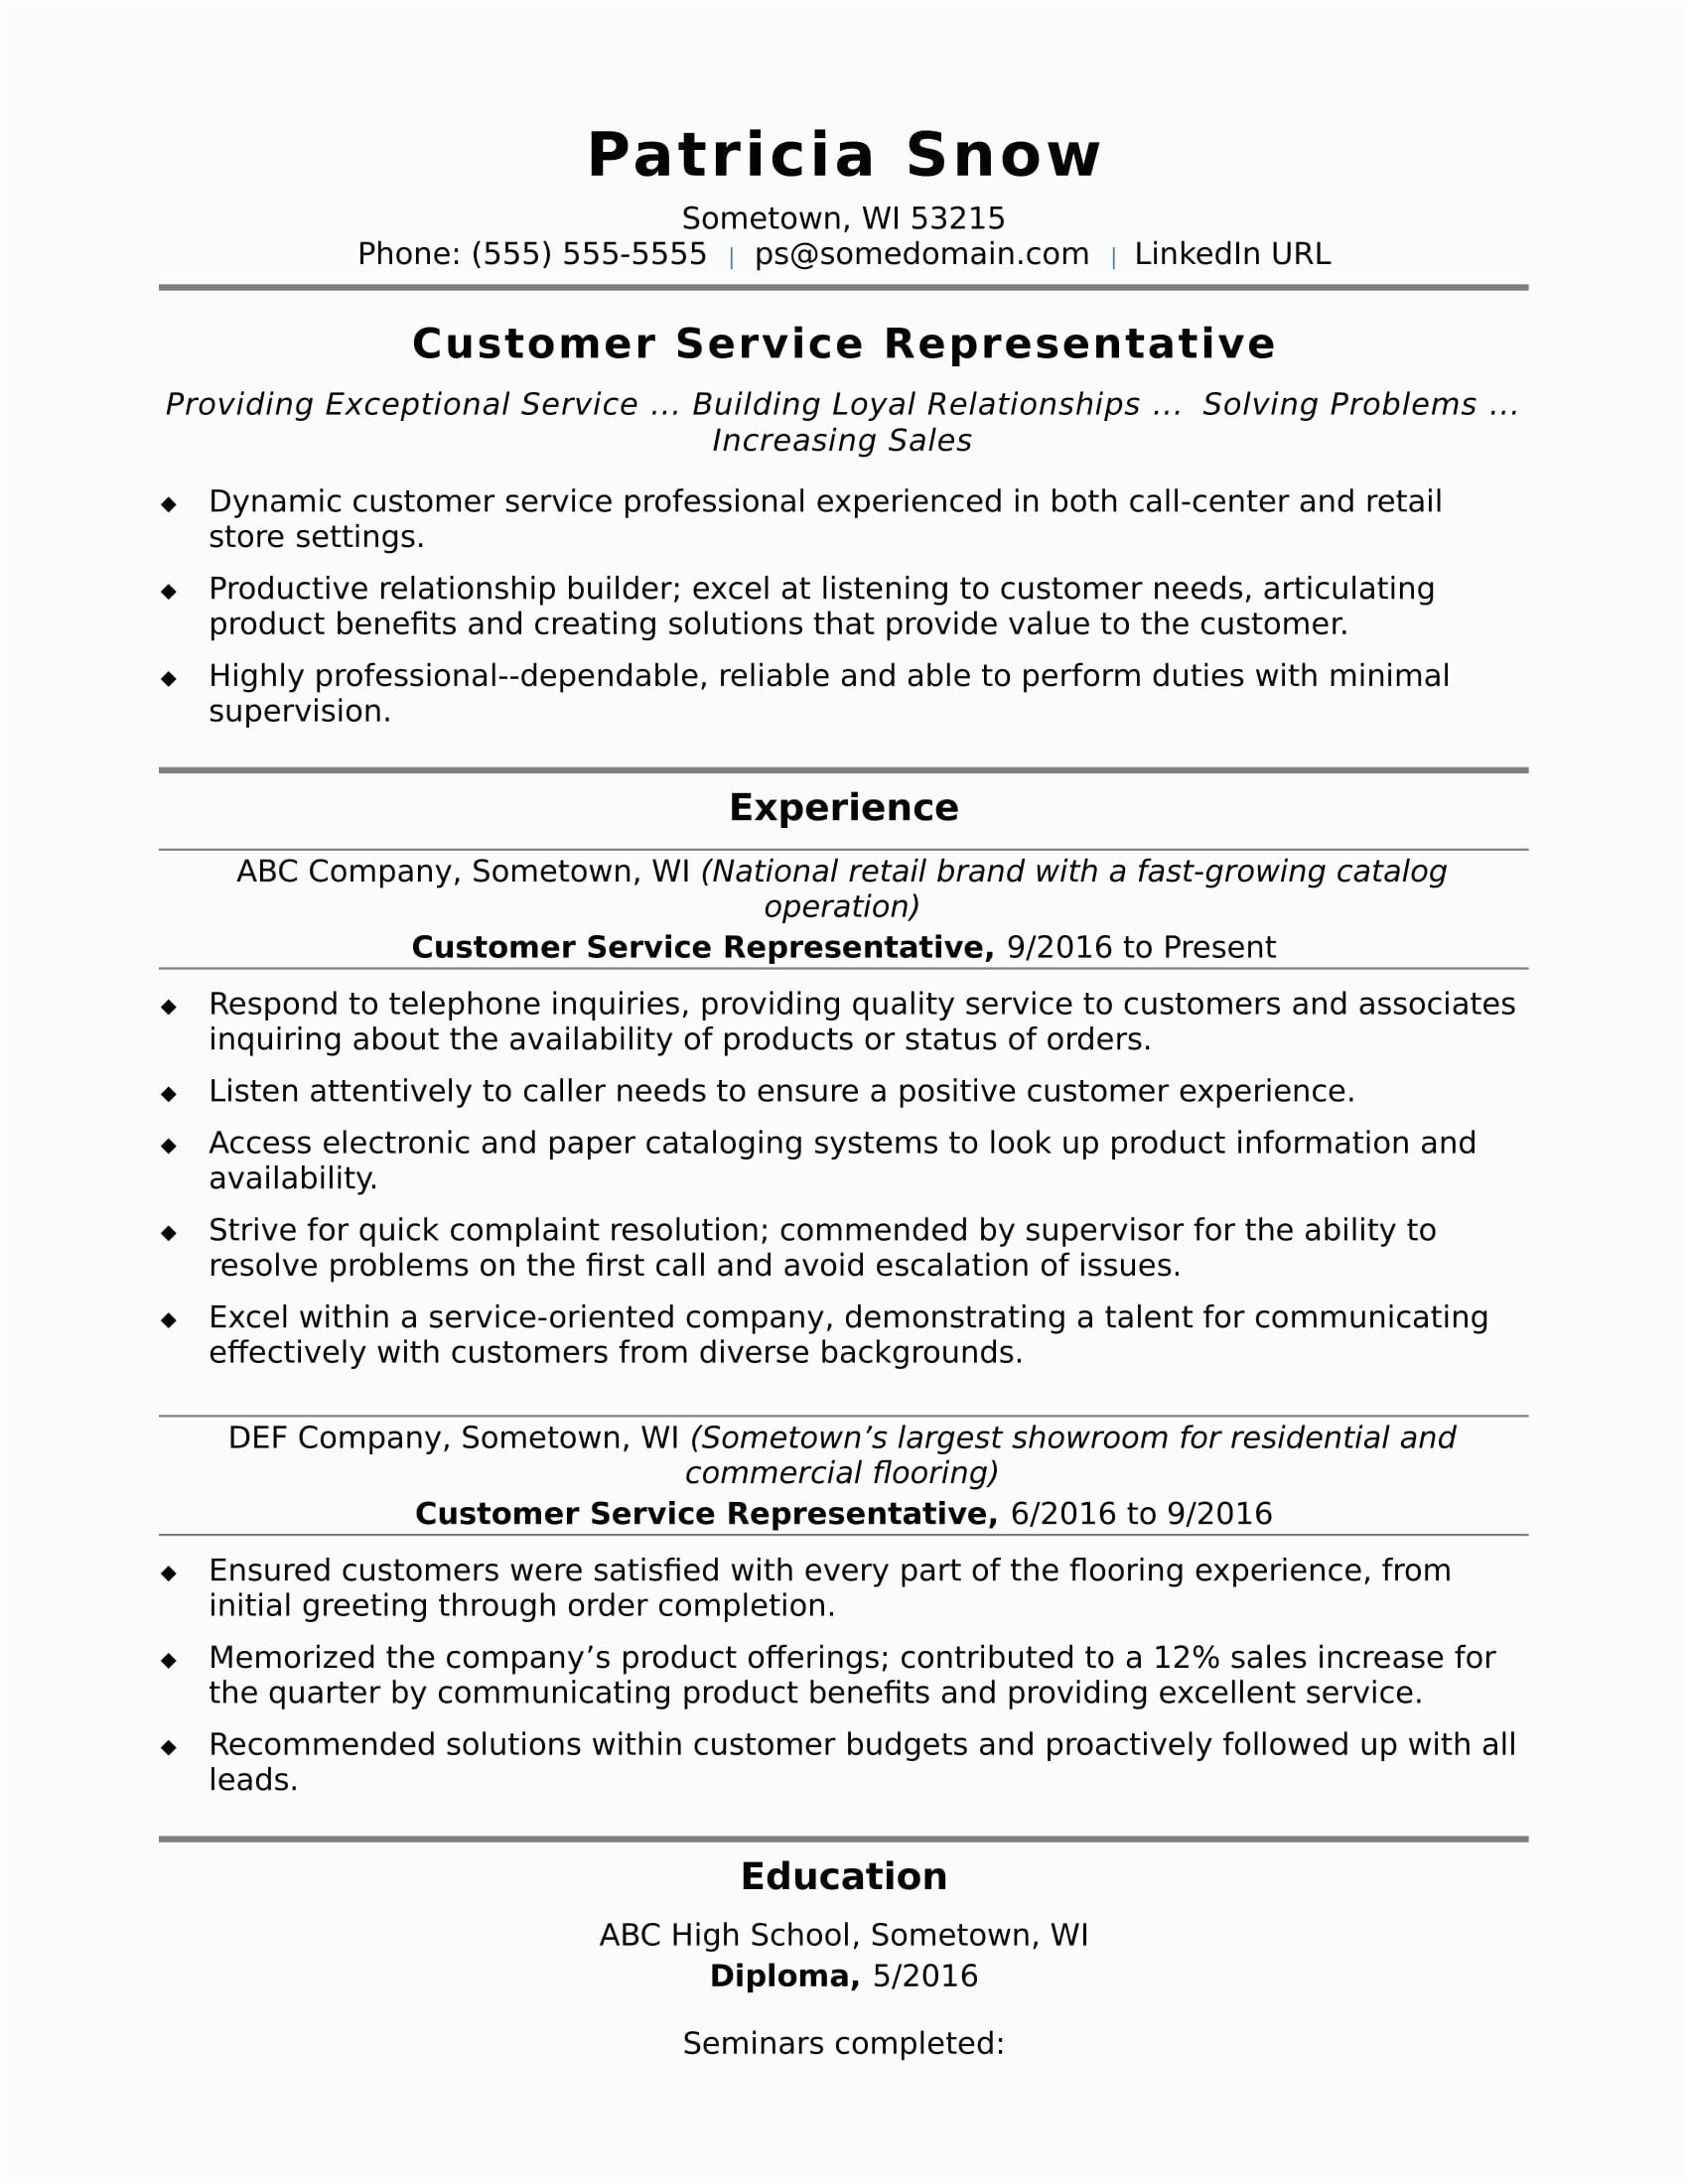 sample resume customer service representative entry level